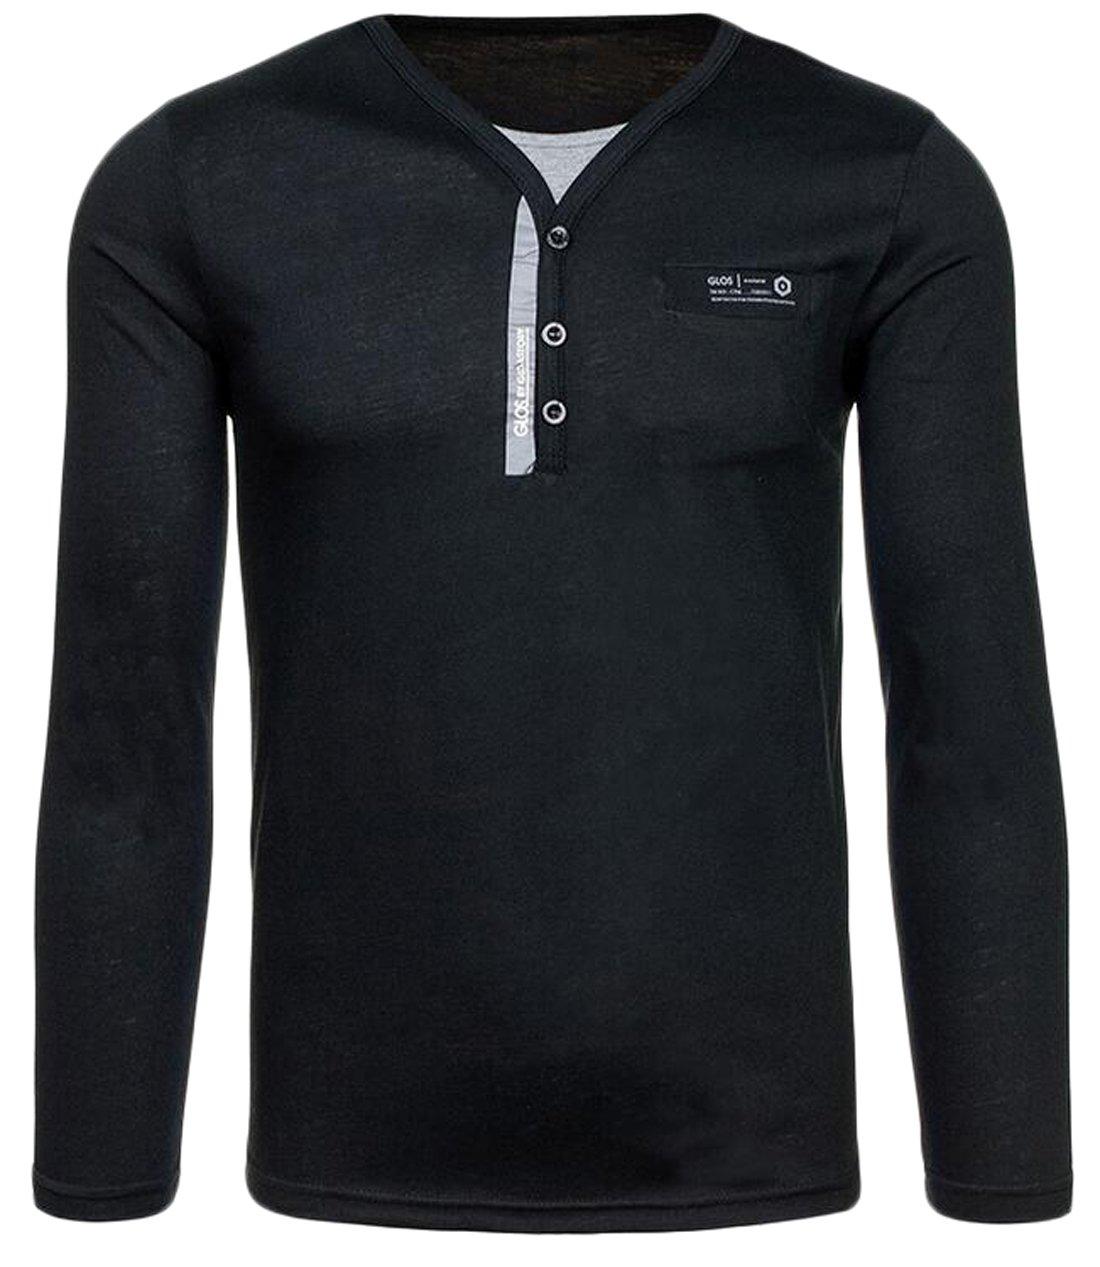 Ekinbrown men 39 s soft buttons v neck long sleeve henley for Black long sleeve henley shirt